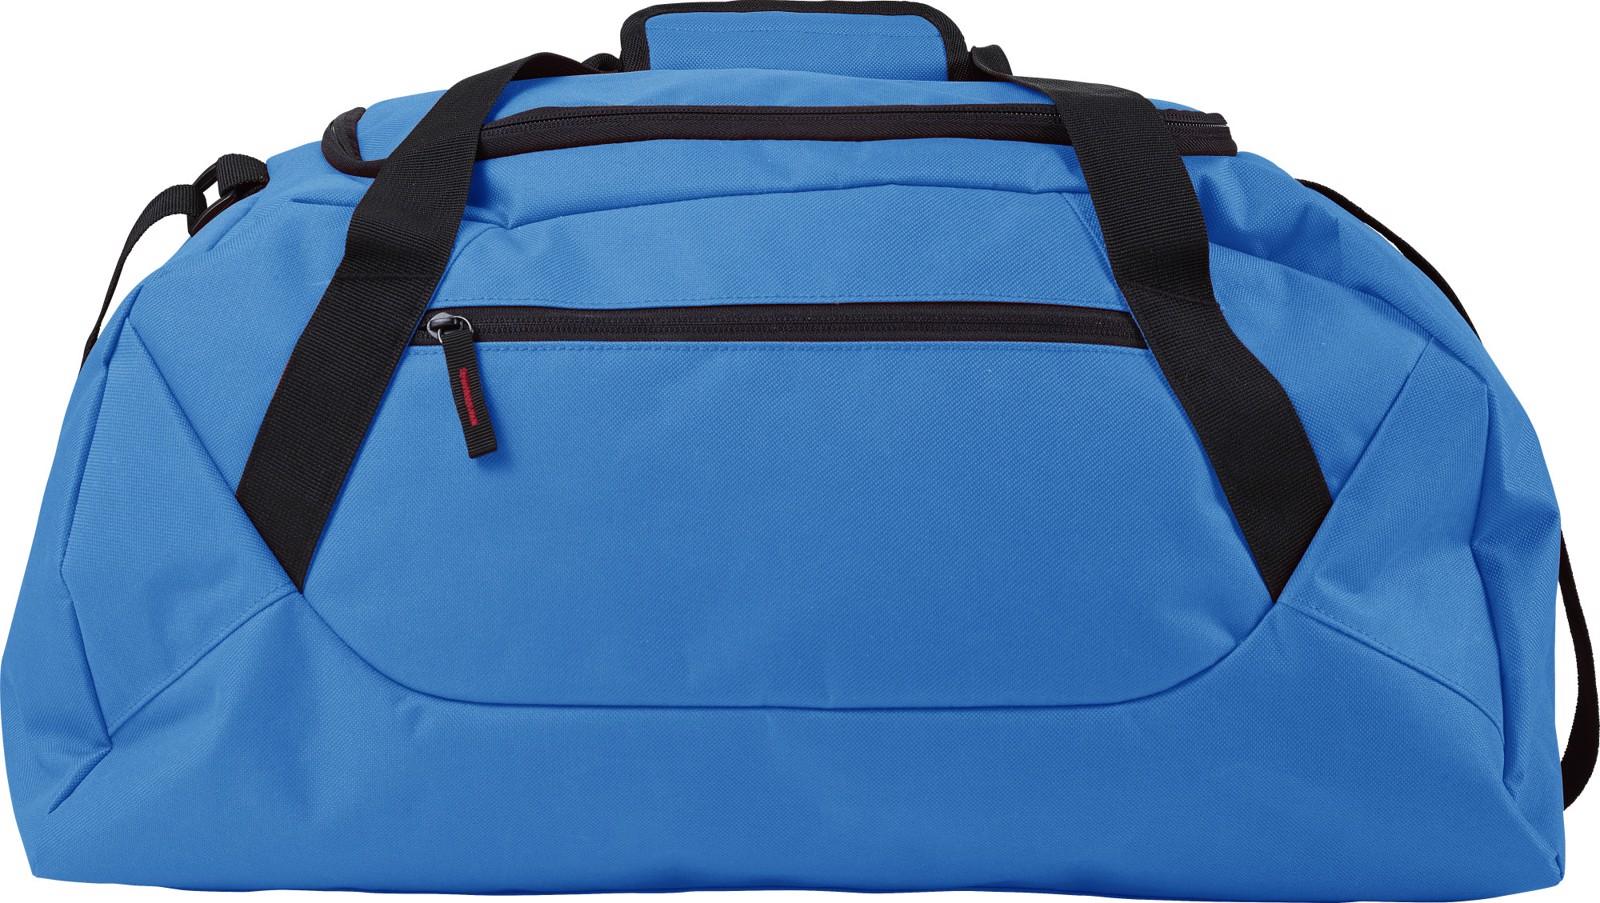 Polyester (600D) sports bag - Blue